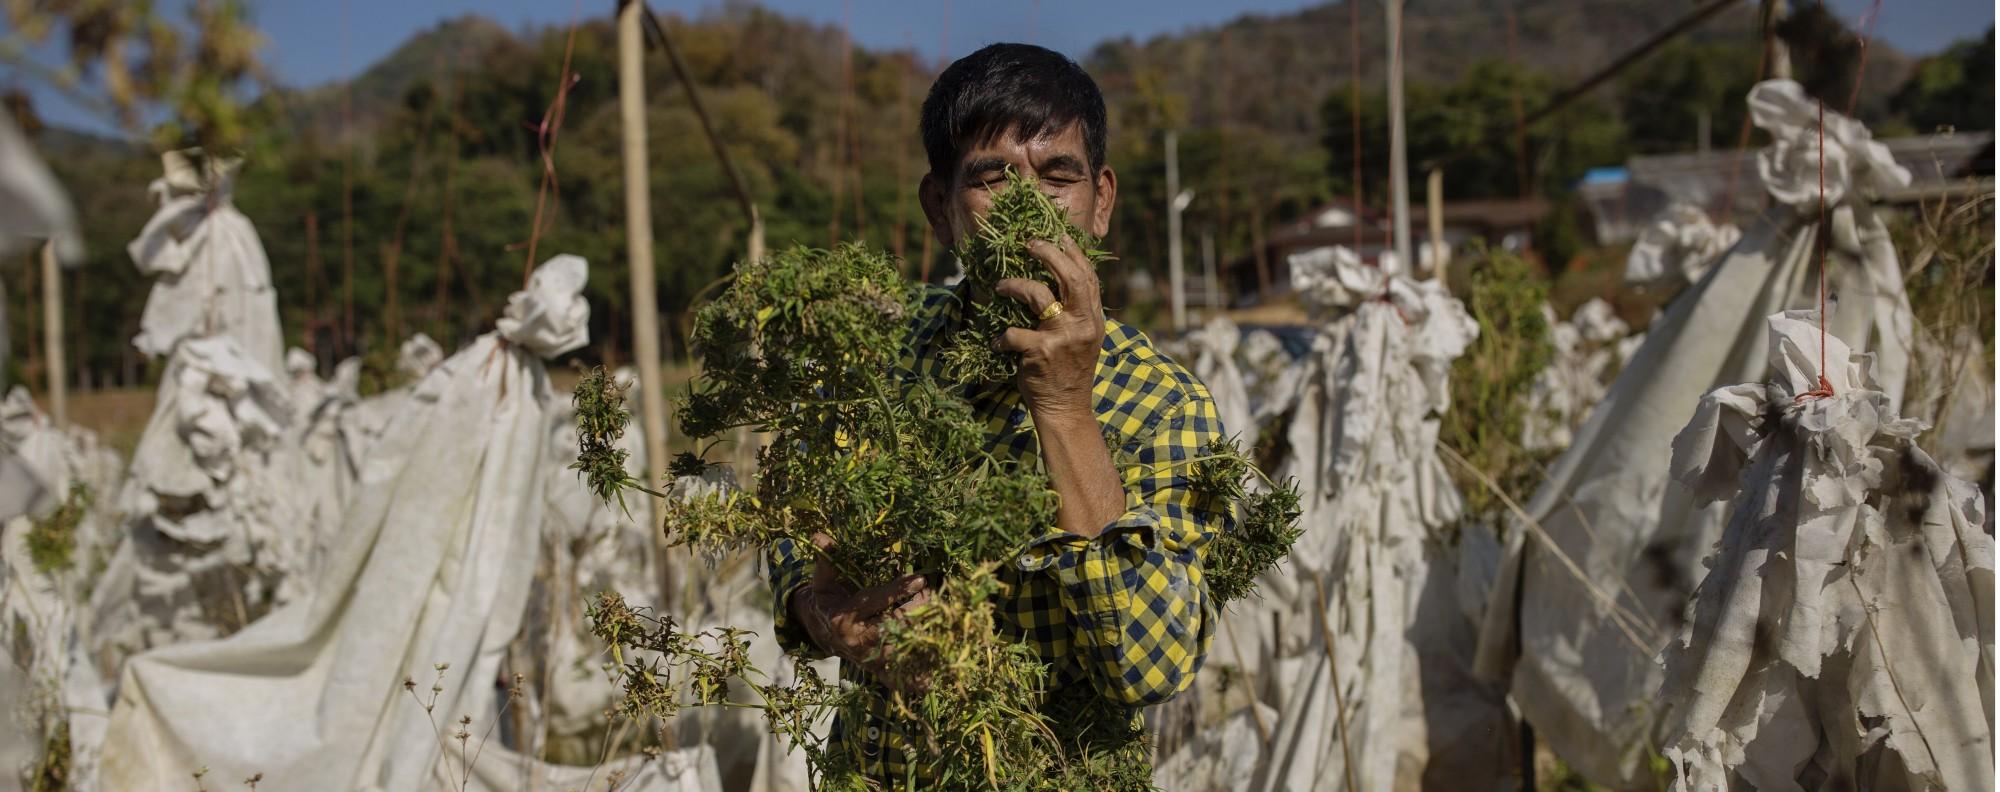 Buntoon Niyamapha examines cannabis plants outside Chiang Mai, Thailand. Picture: Jonas Gratzer